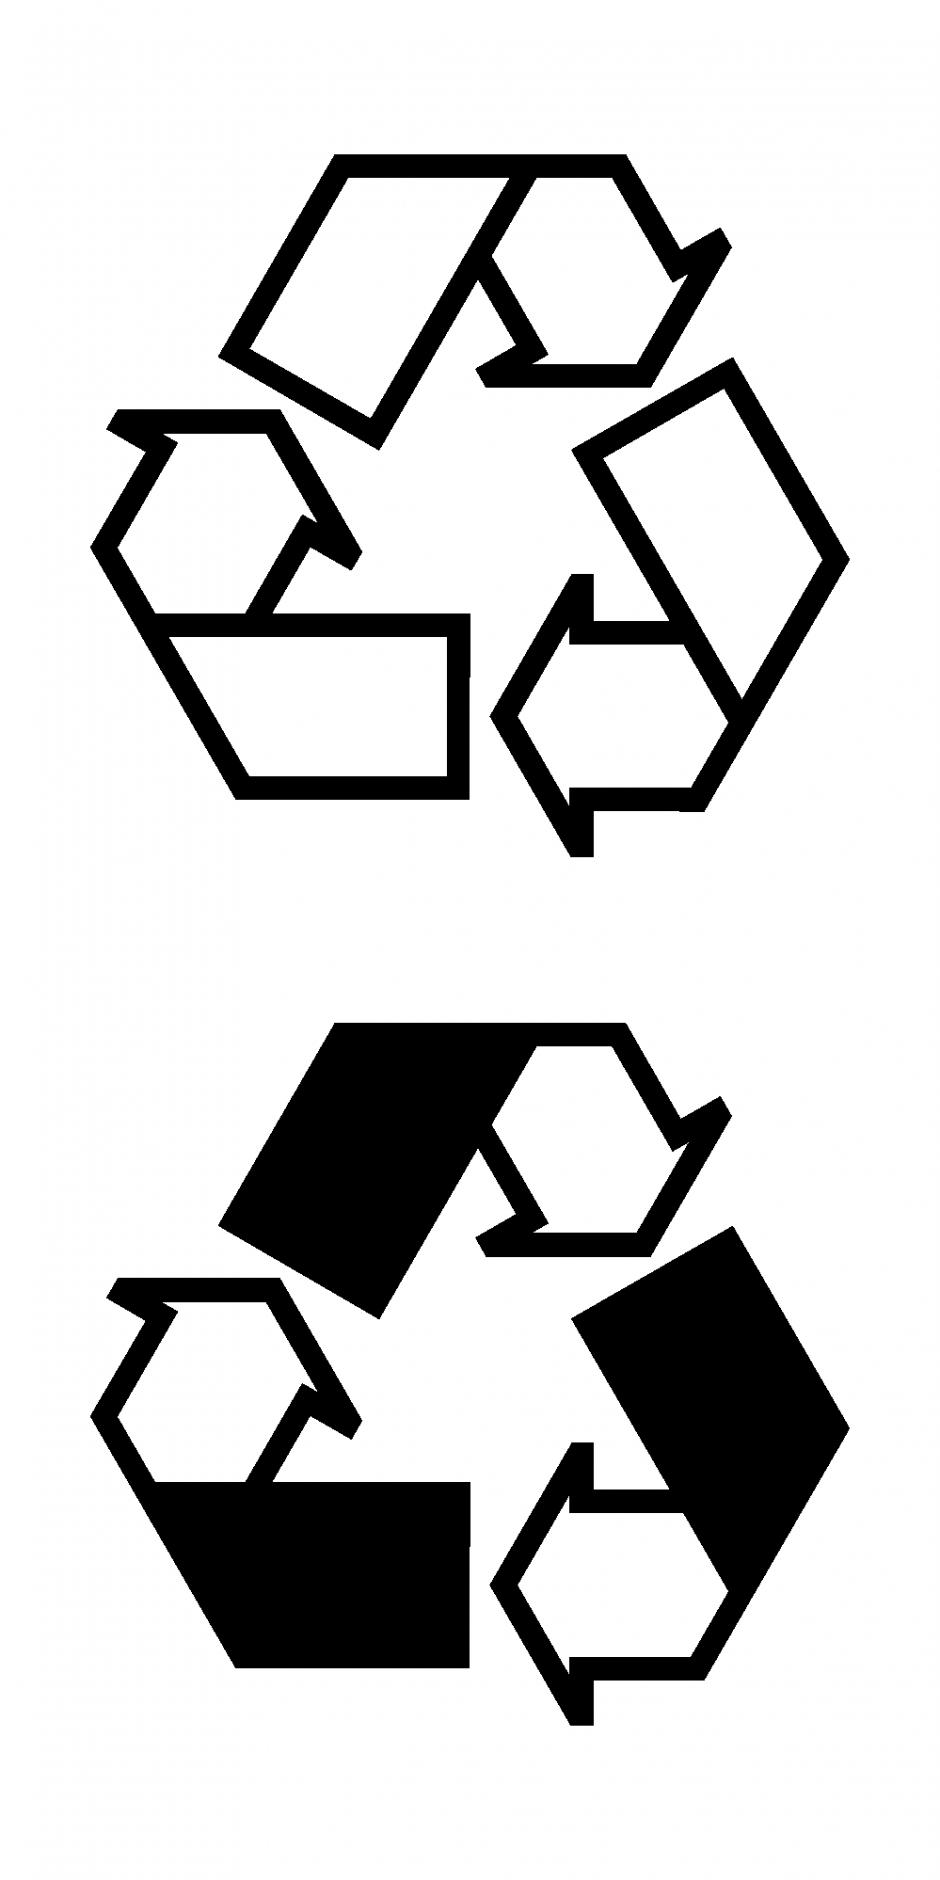 Panda free images purplecrayonclipart. Crayons clipart purple crayon